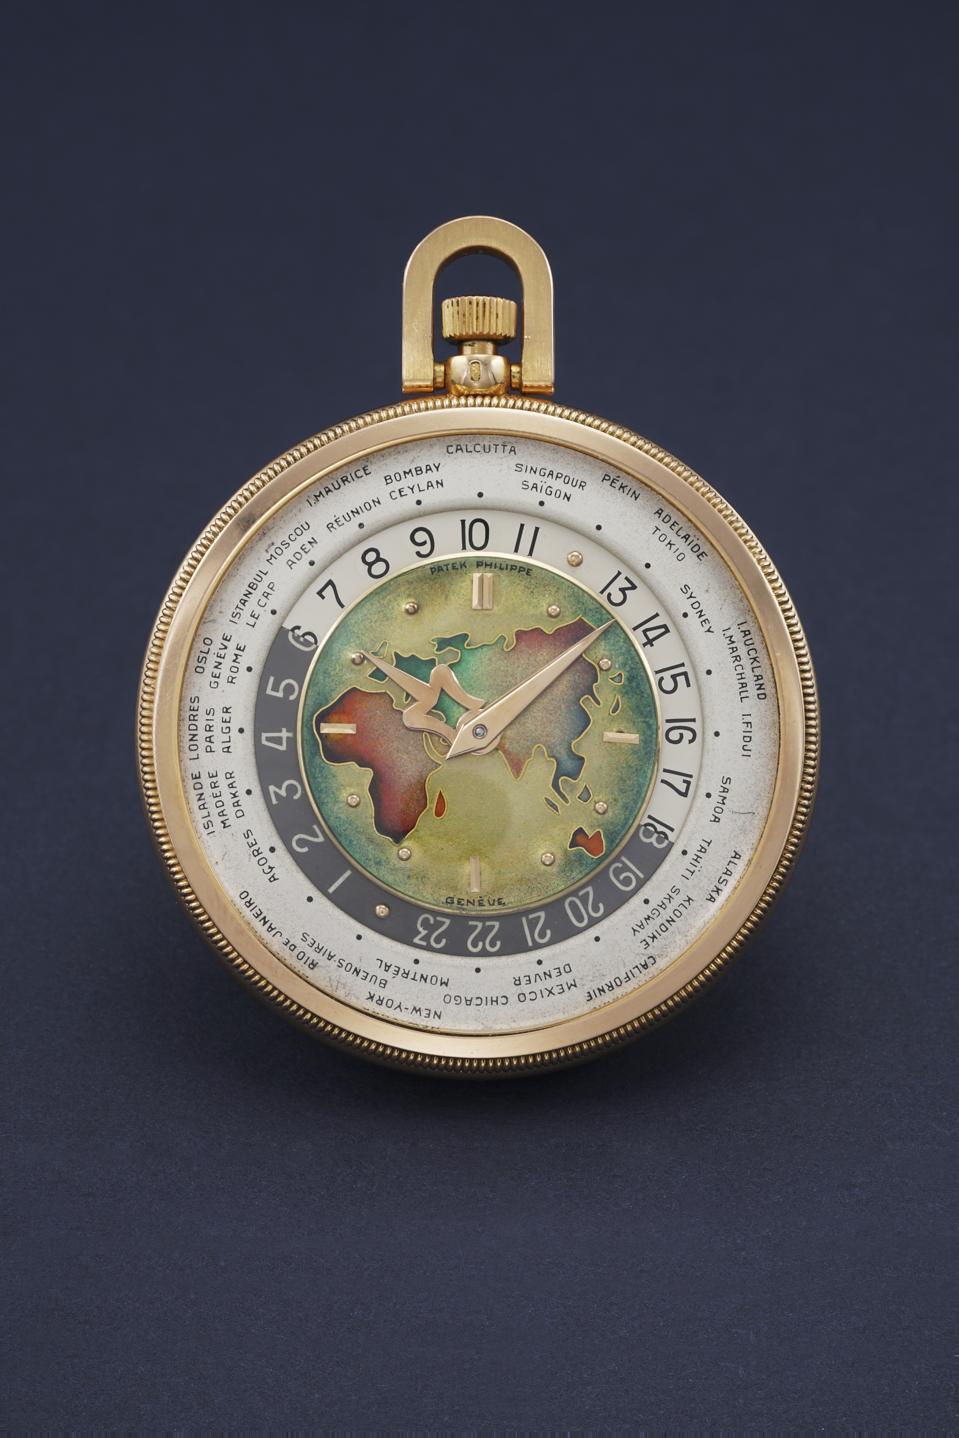 Patek Philippe 605 HU Pocket Watch sold for $1.2 million